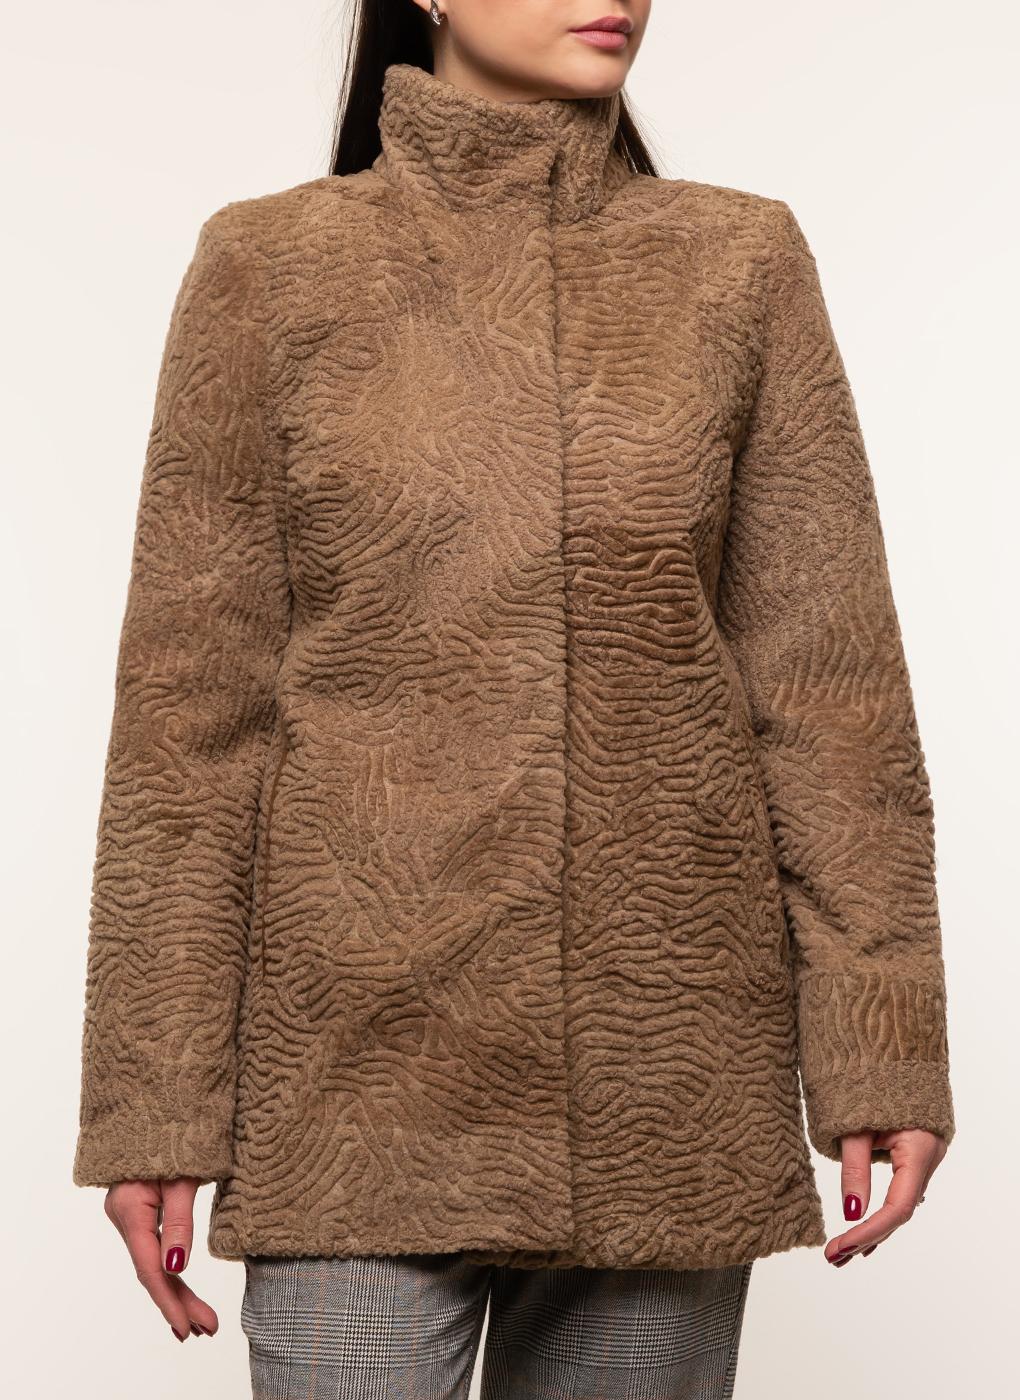 Куртка из овчины 07, Dzhanbekoff фото